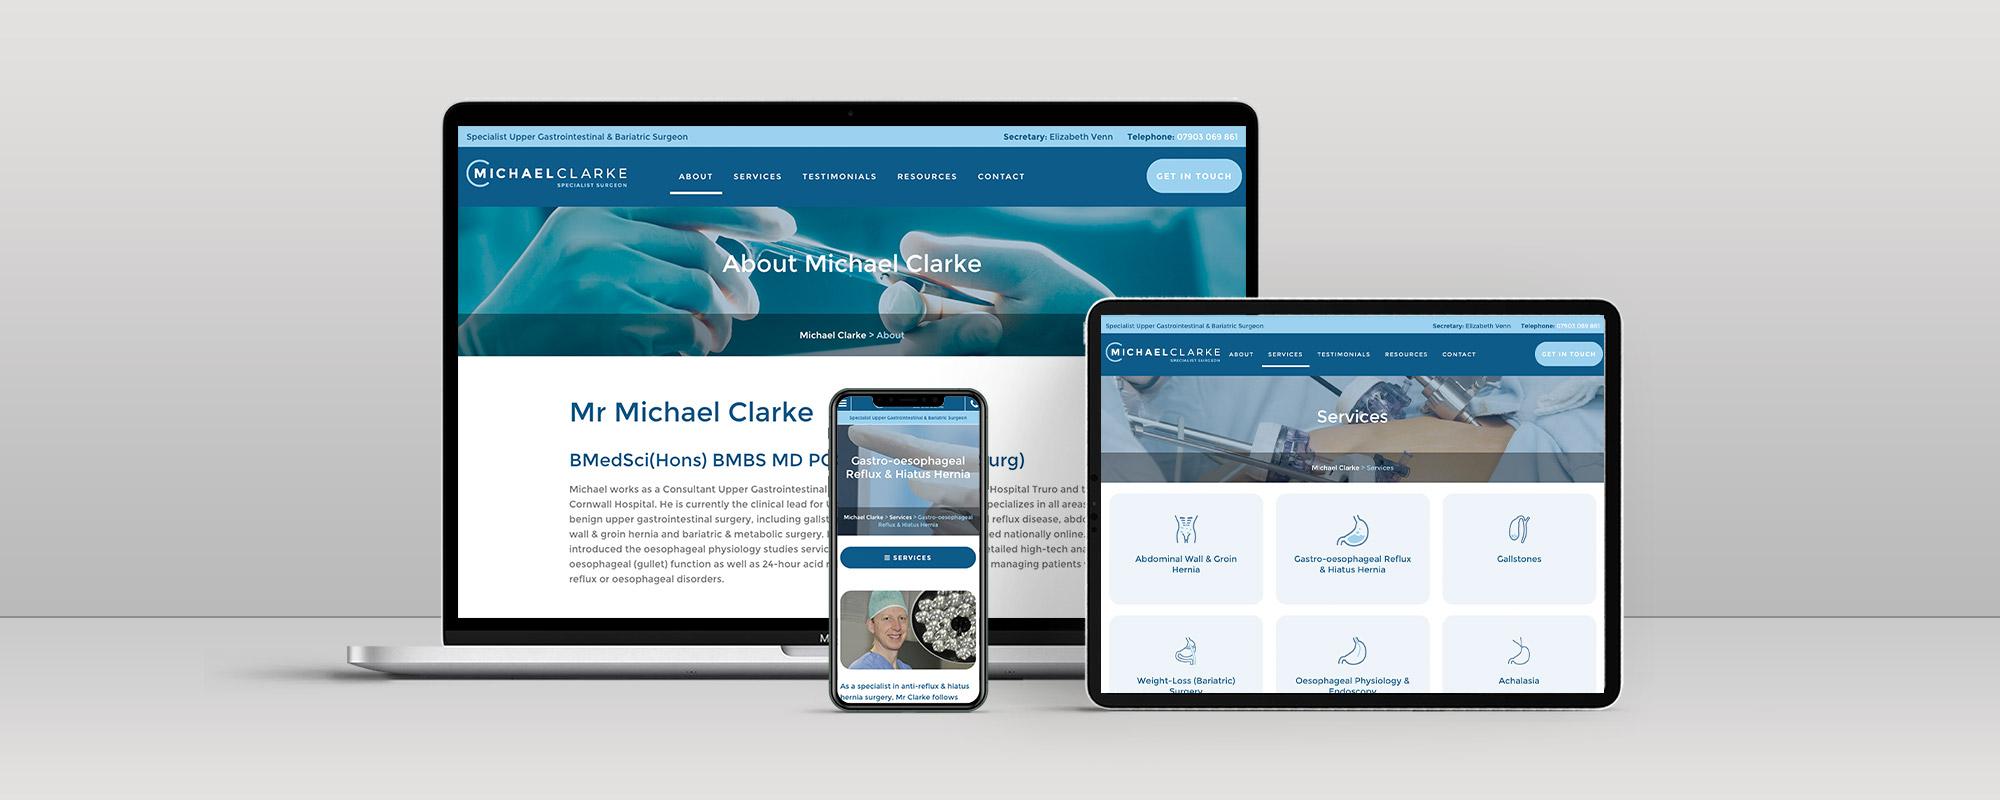 Michael Clarke Wordpress Website Design on 3 Devices